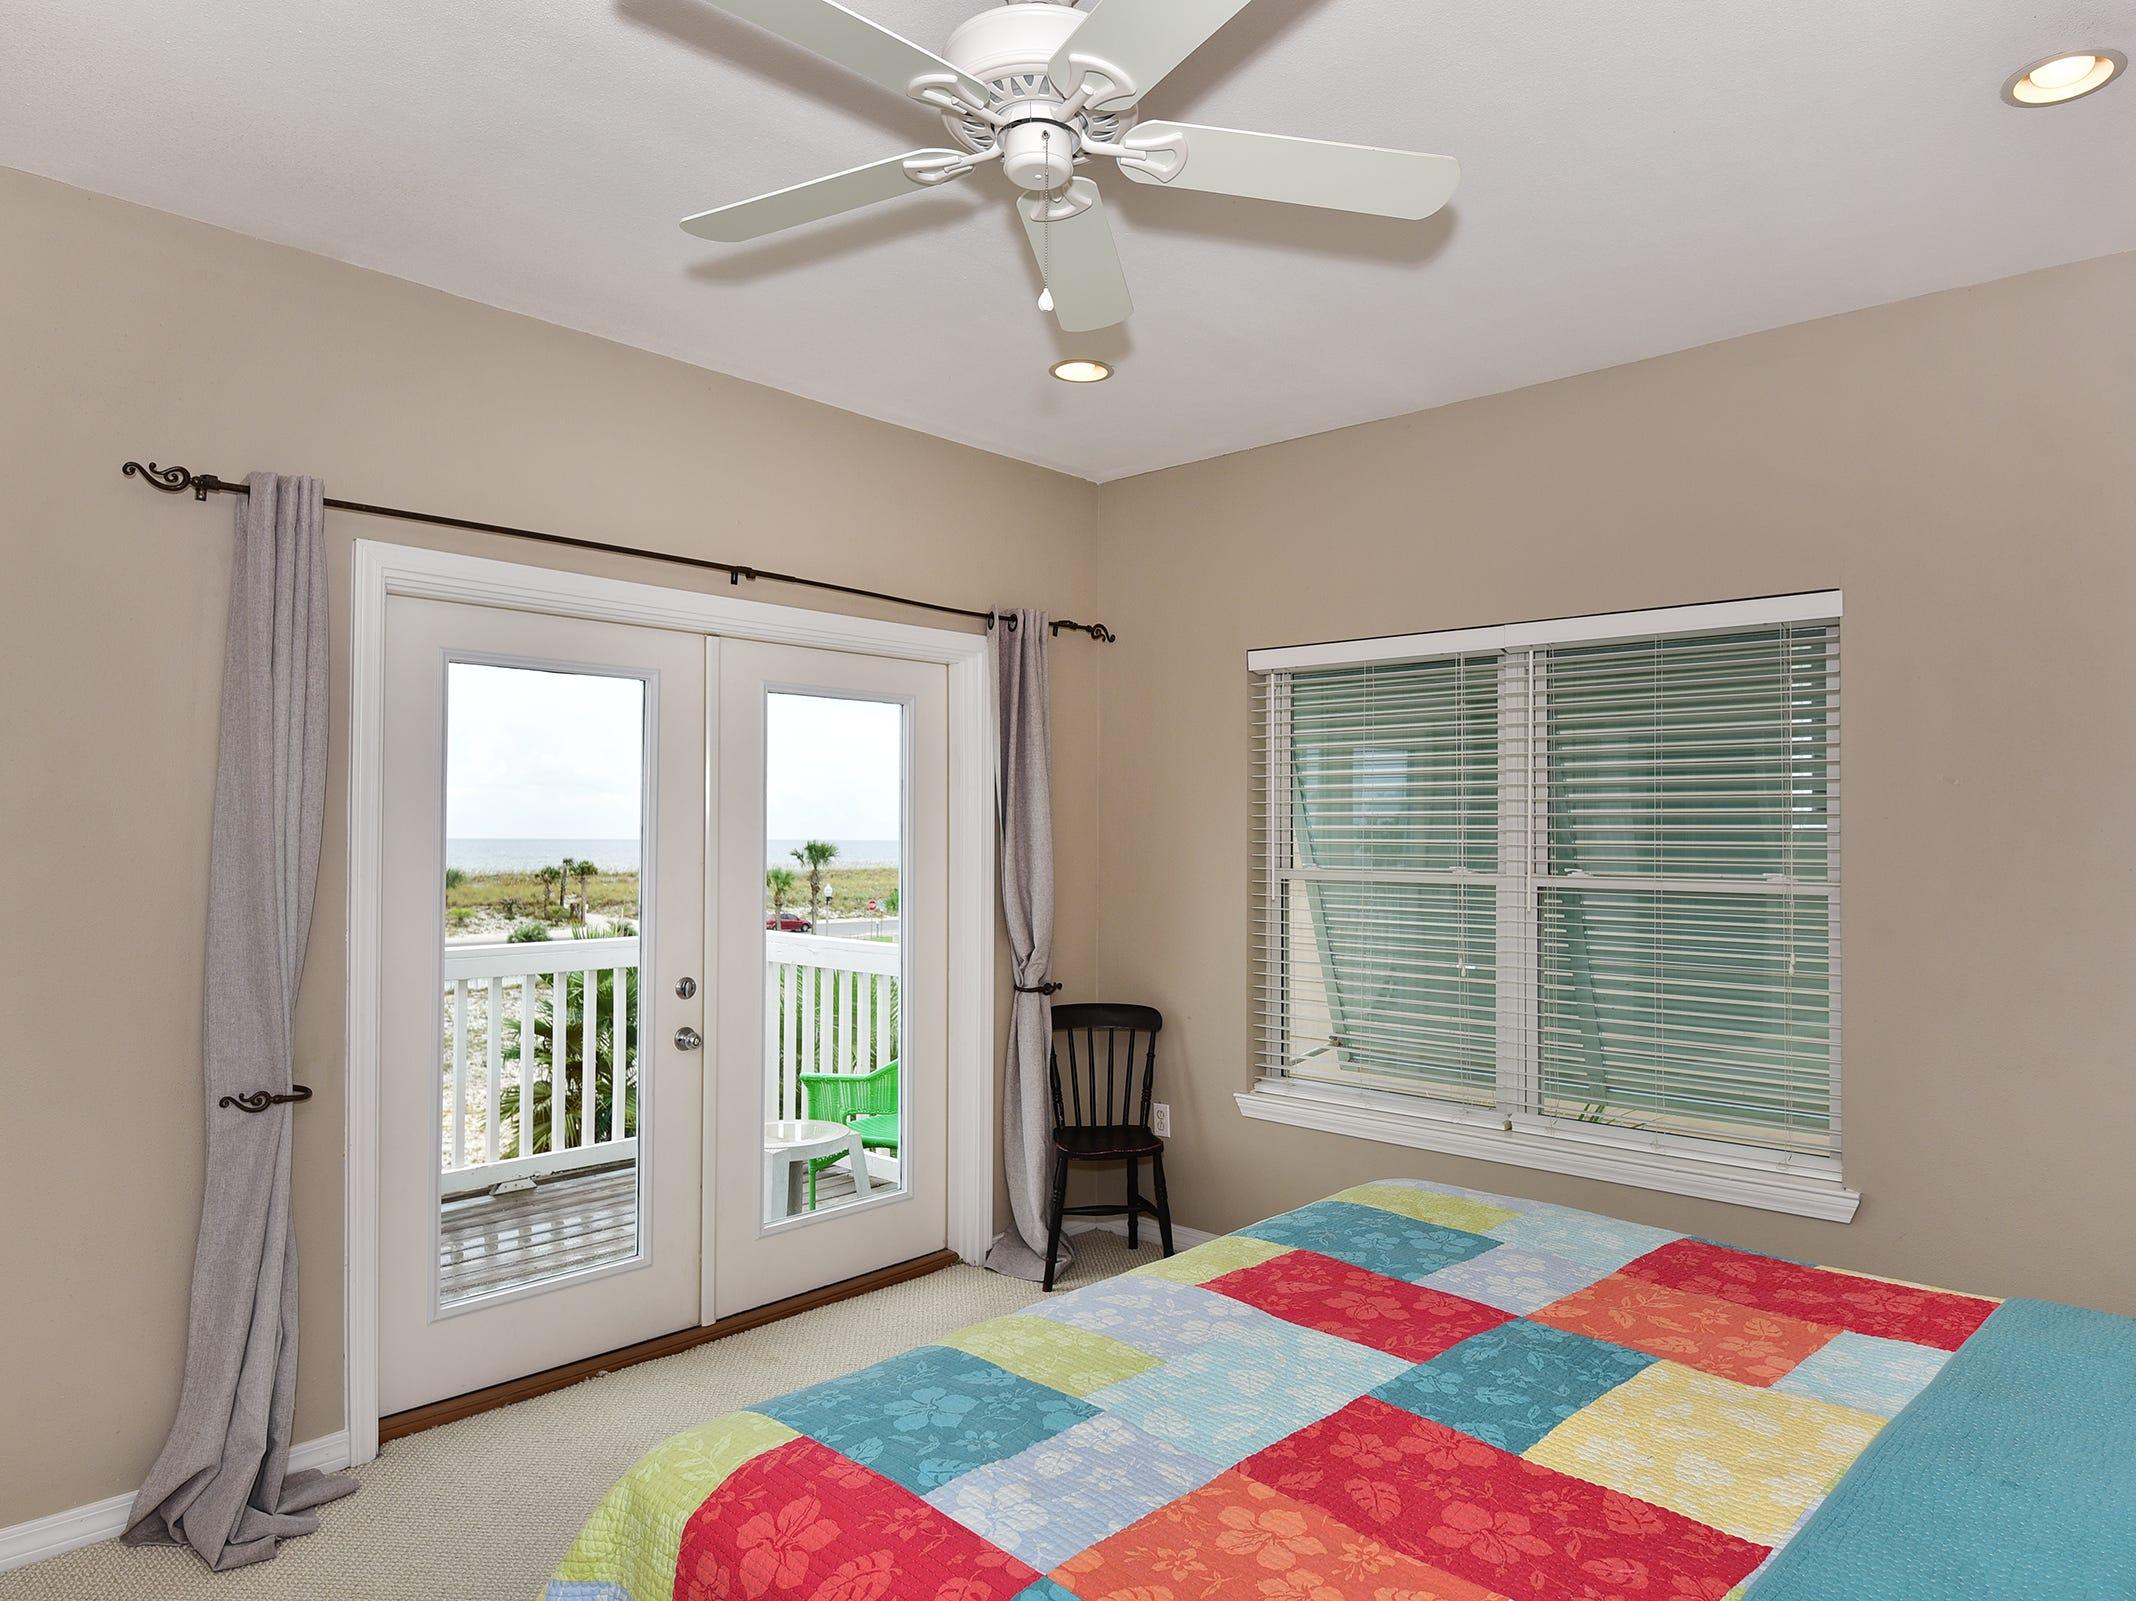 14 Ensenada MarbellaThe master suite includes balcony access.